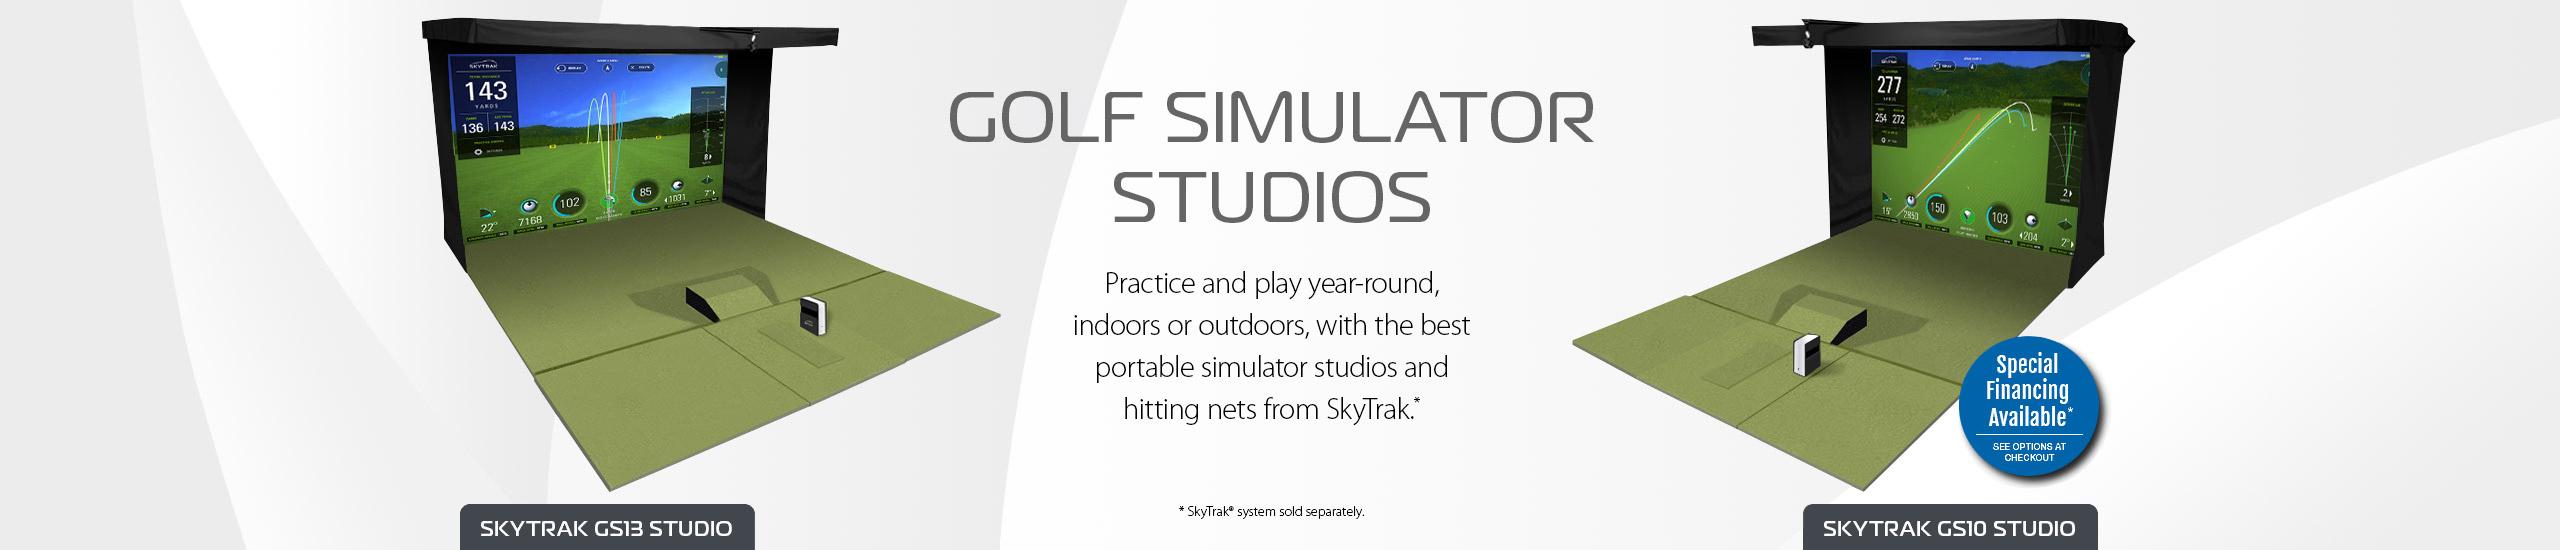 SkyTrak_HittingBays_header_2560x550_2[1]